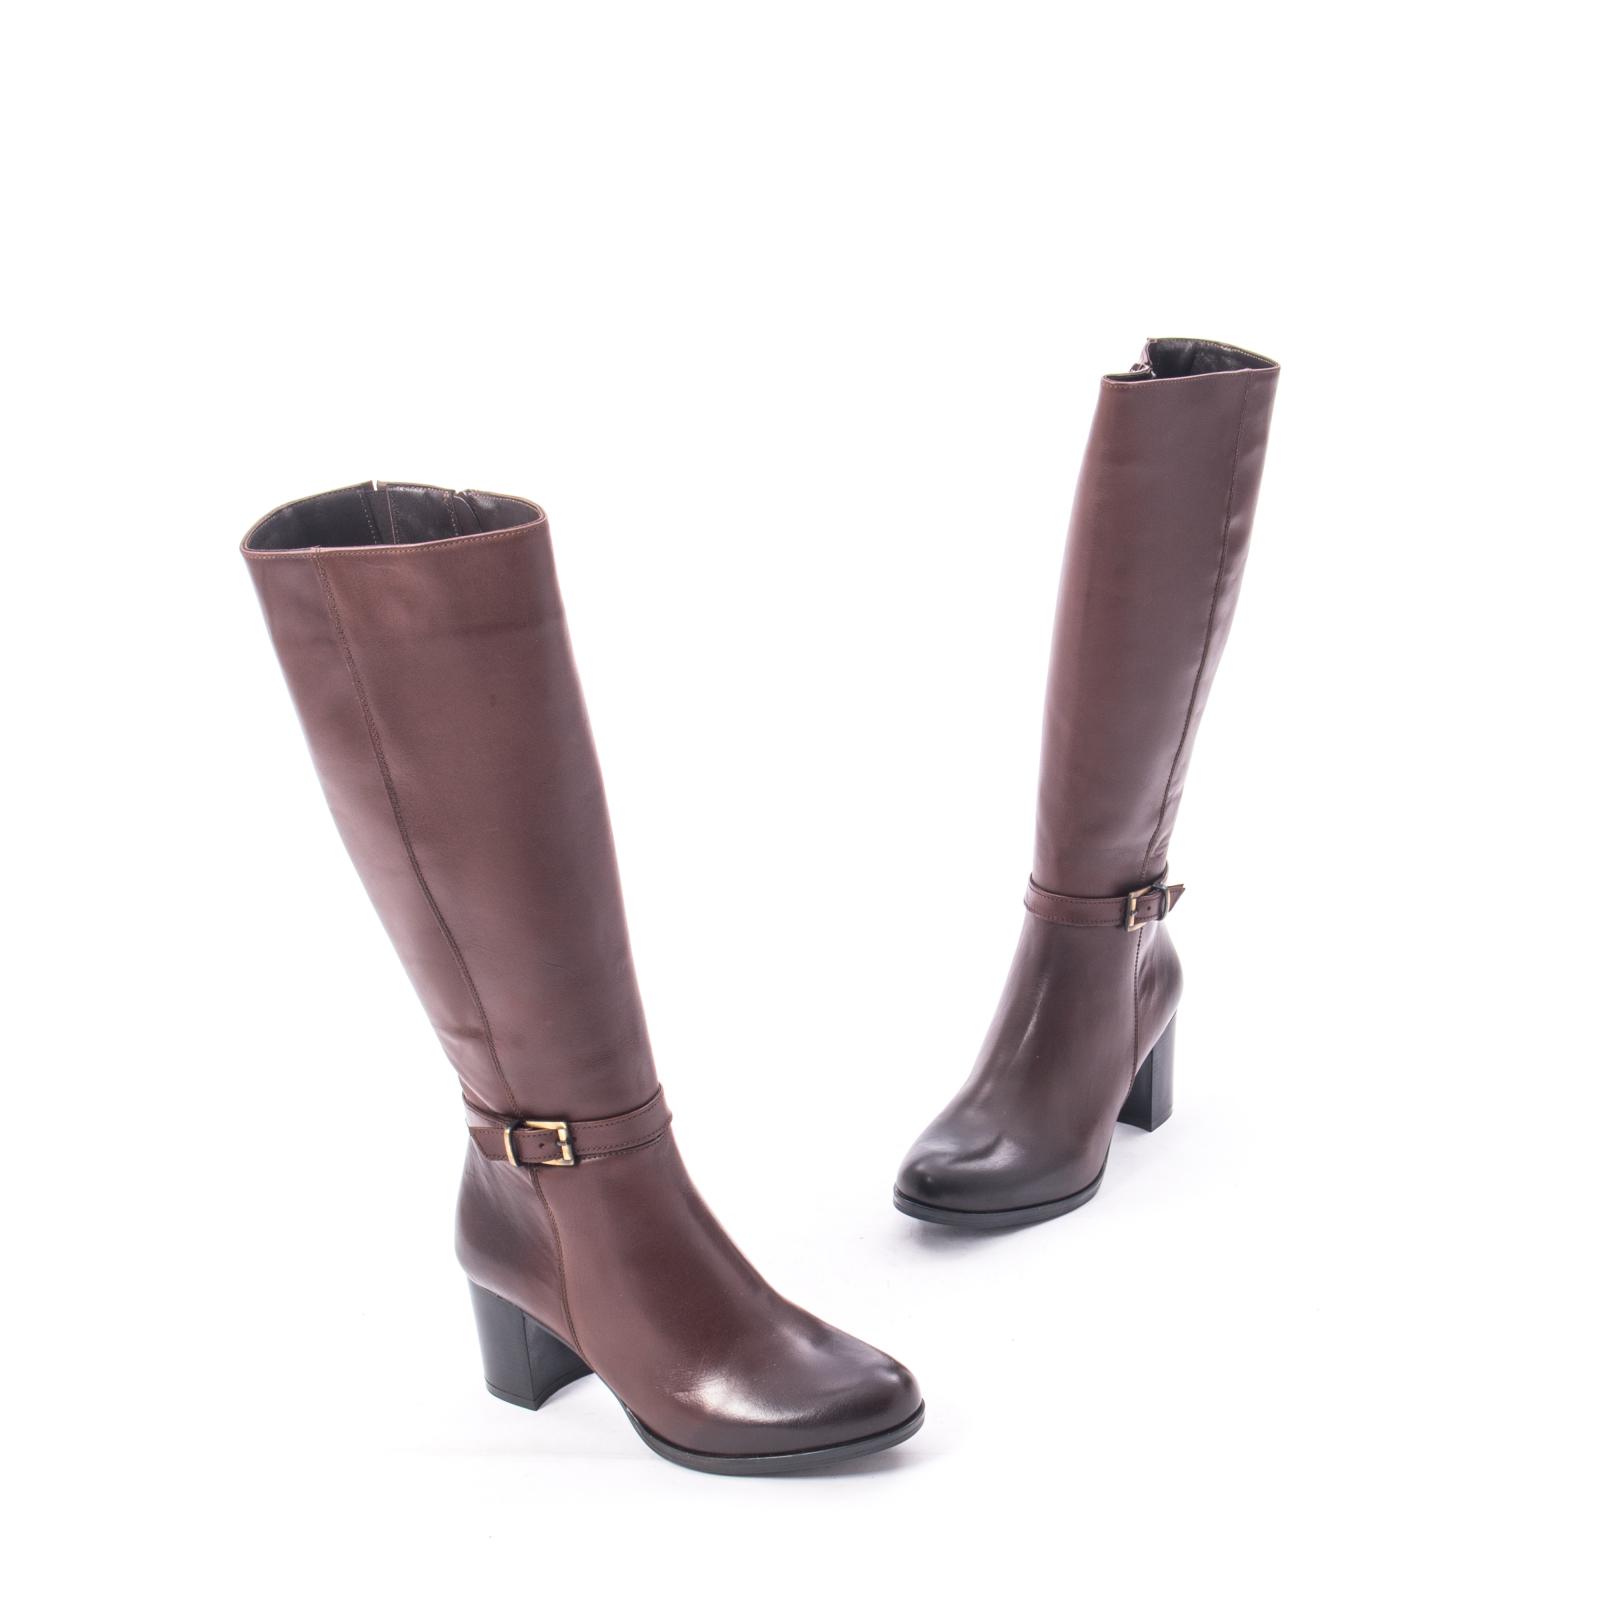 ceas Pantofi 2018 ofera reduceri Cizme dama elegante piele naturala Catali 182880, maro - Catali